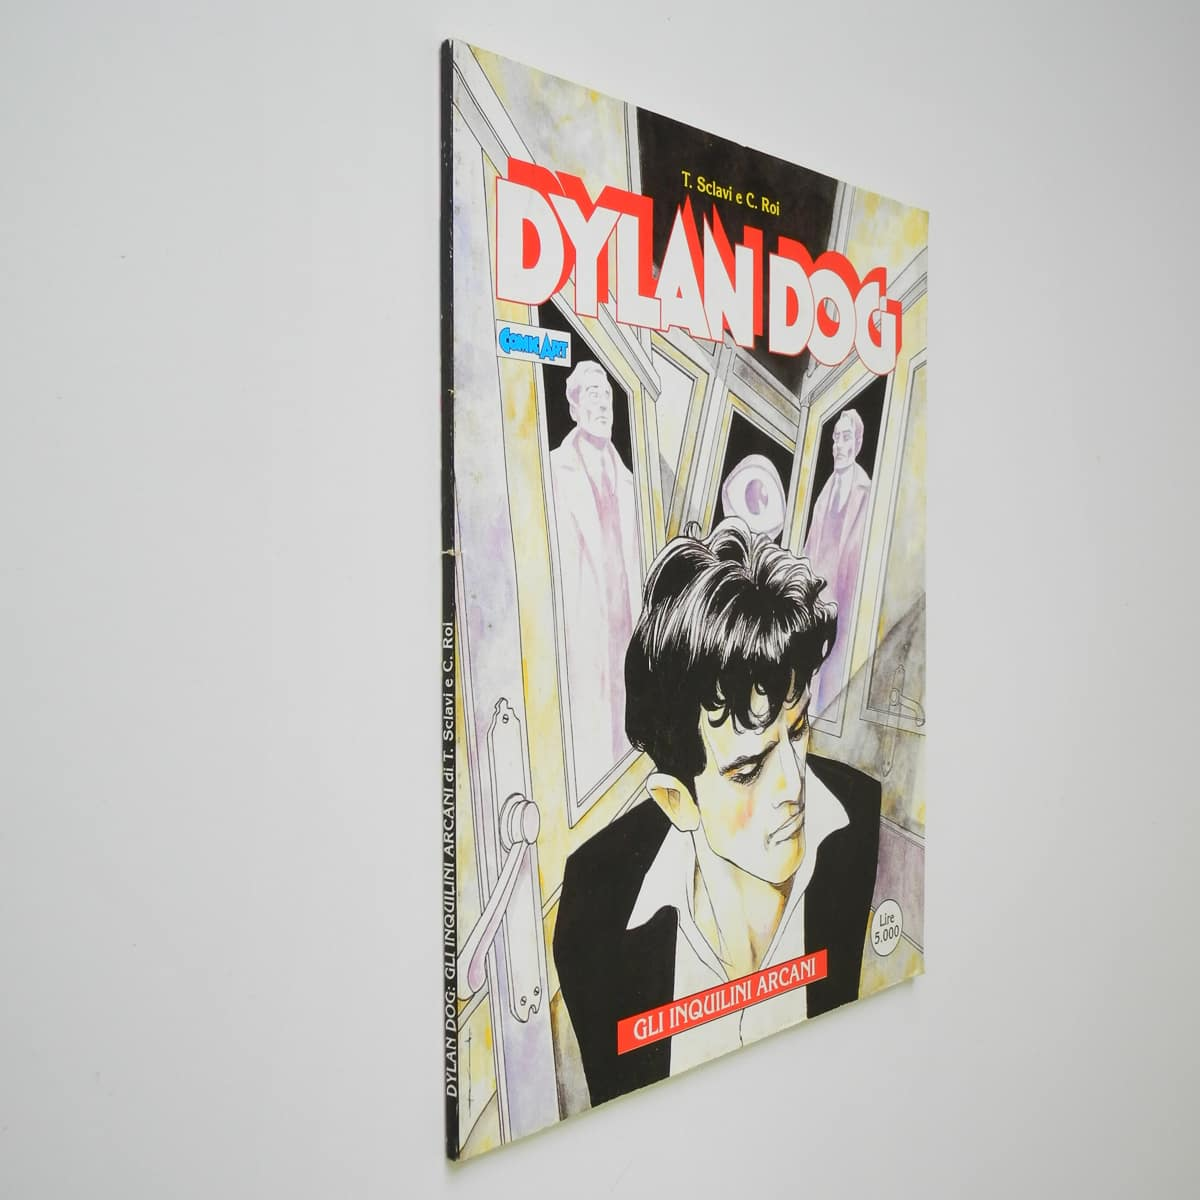 Dylan Dog Gli Inquilini Arcani (2) Comic Art